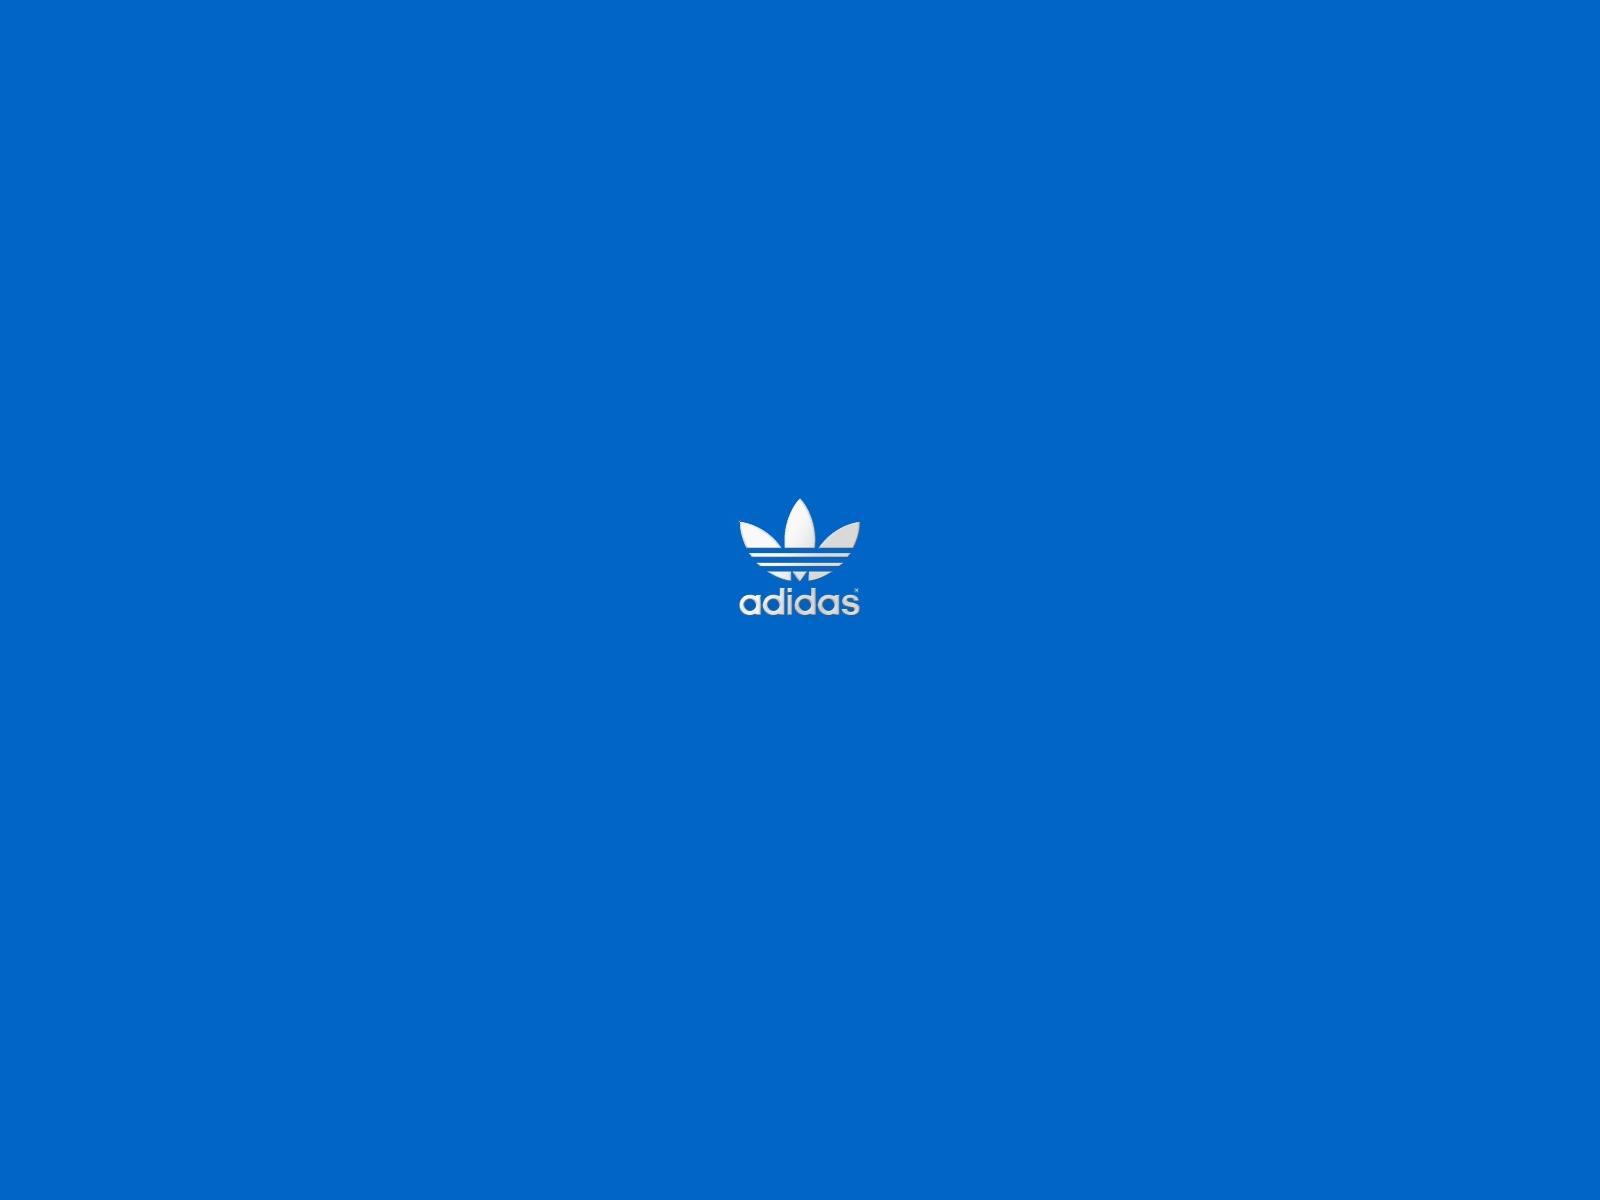 Adidas Logo Wallpapers 2016 Wallpaper Cave